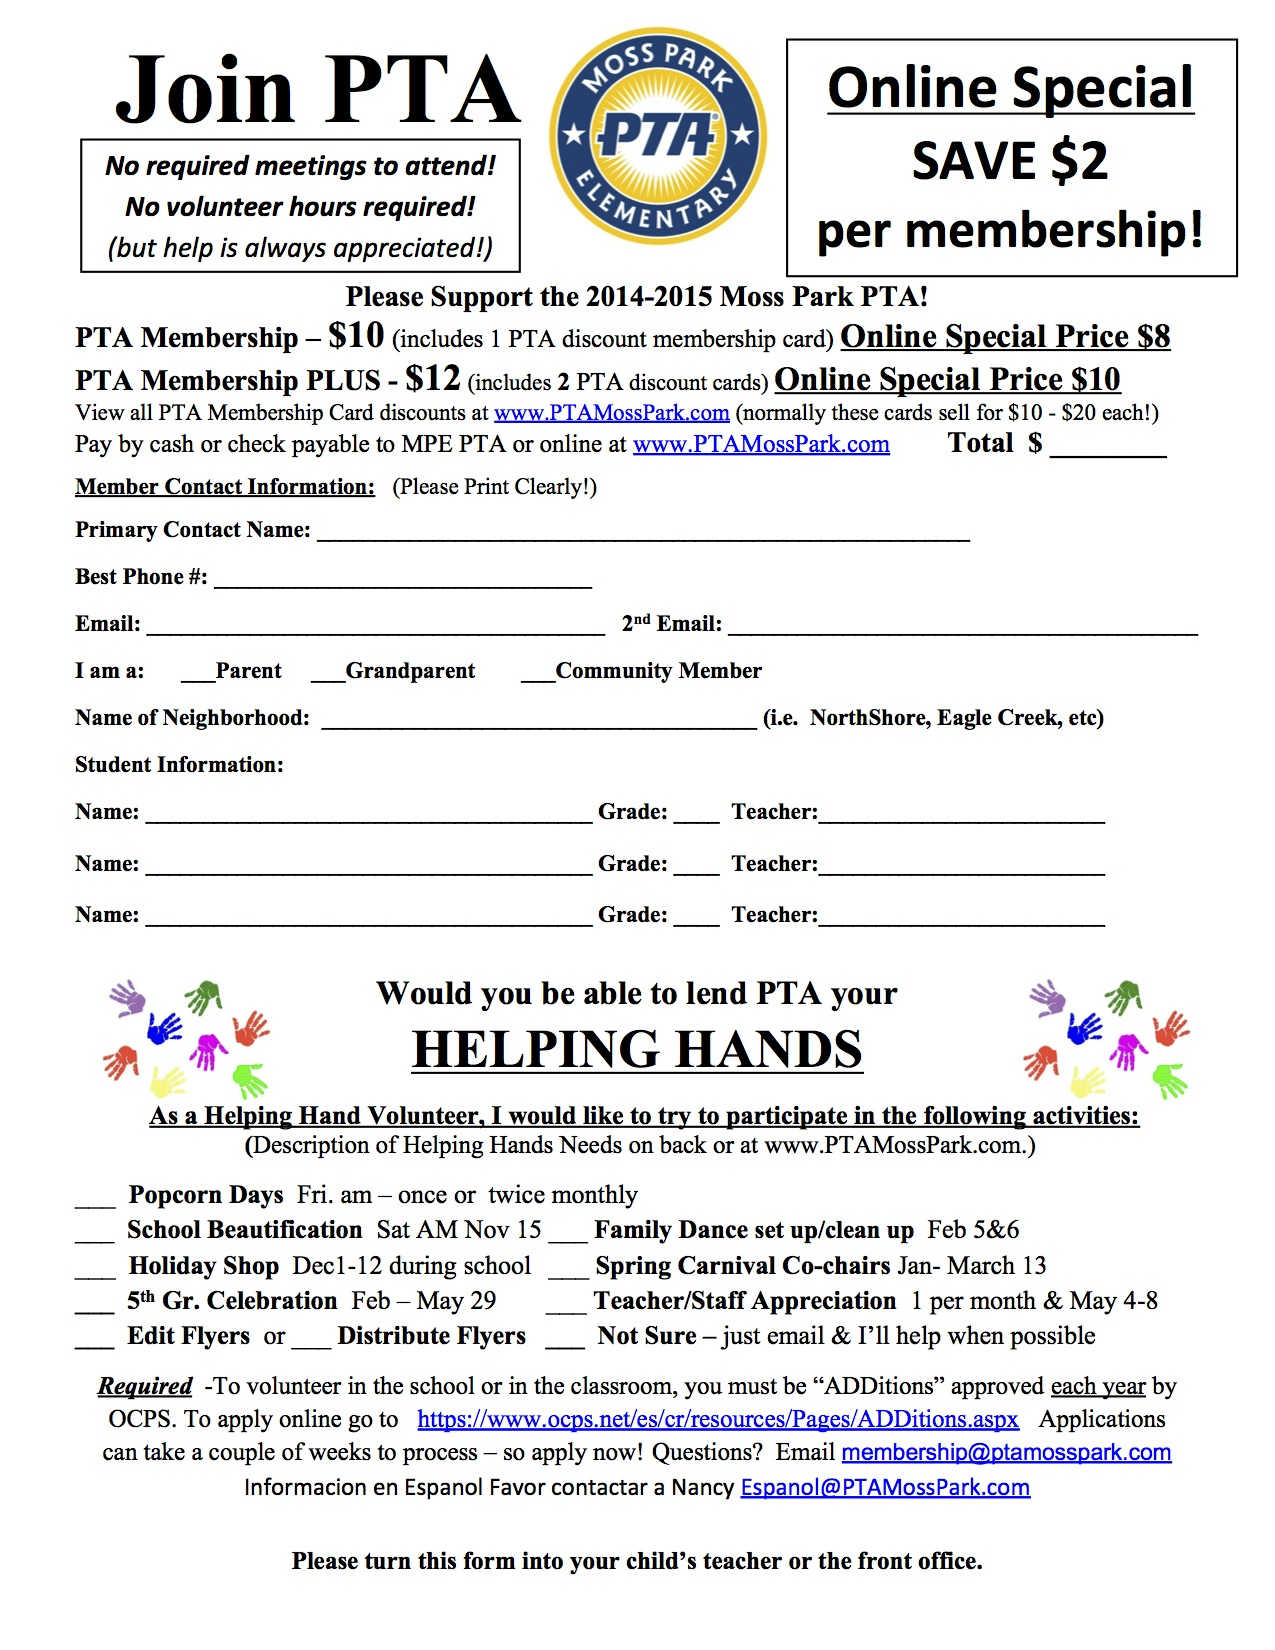 pta membership card template pta membership